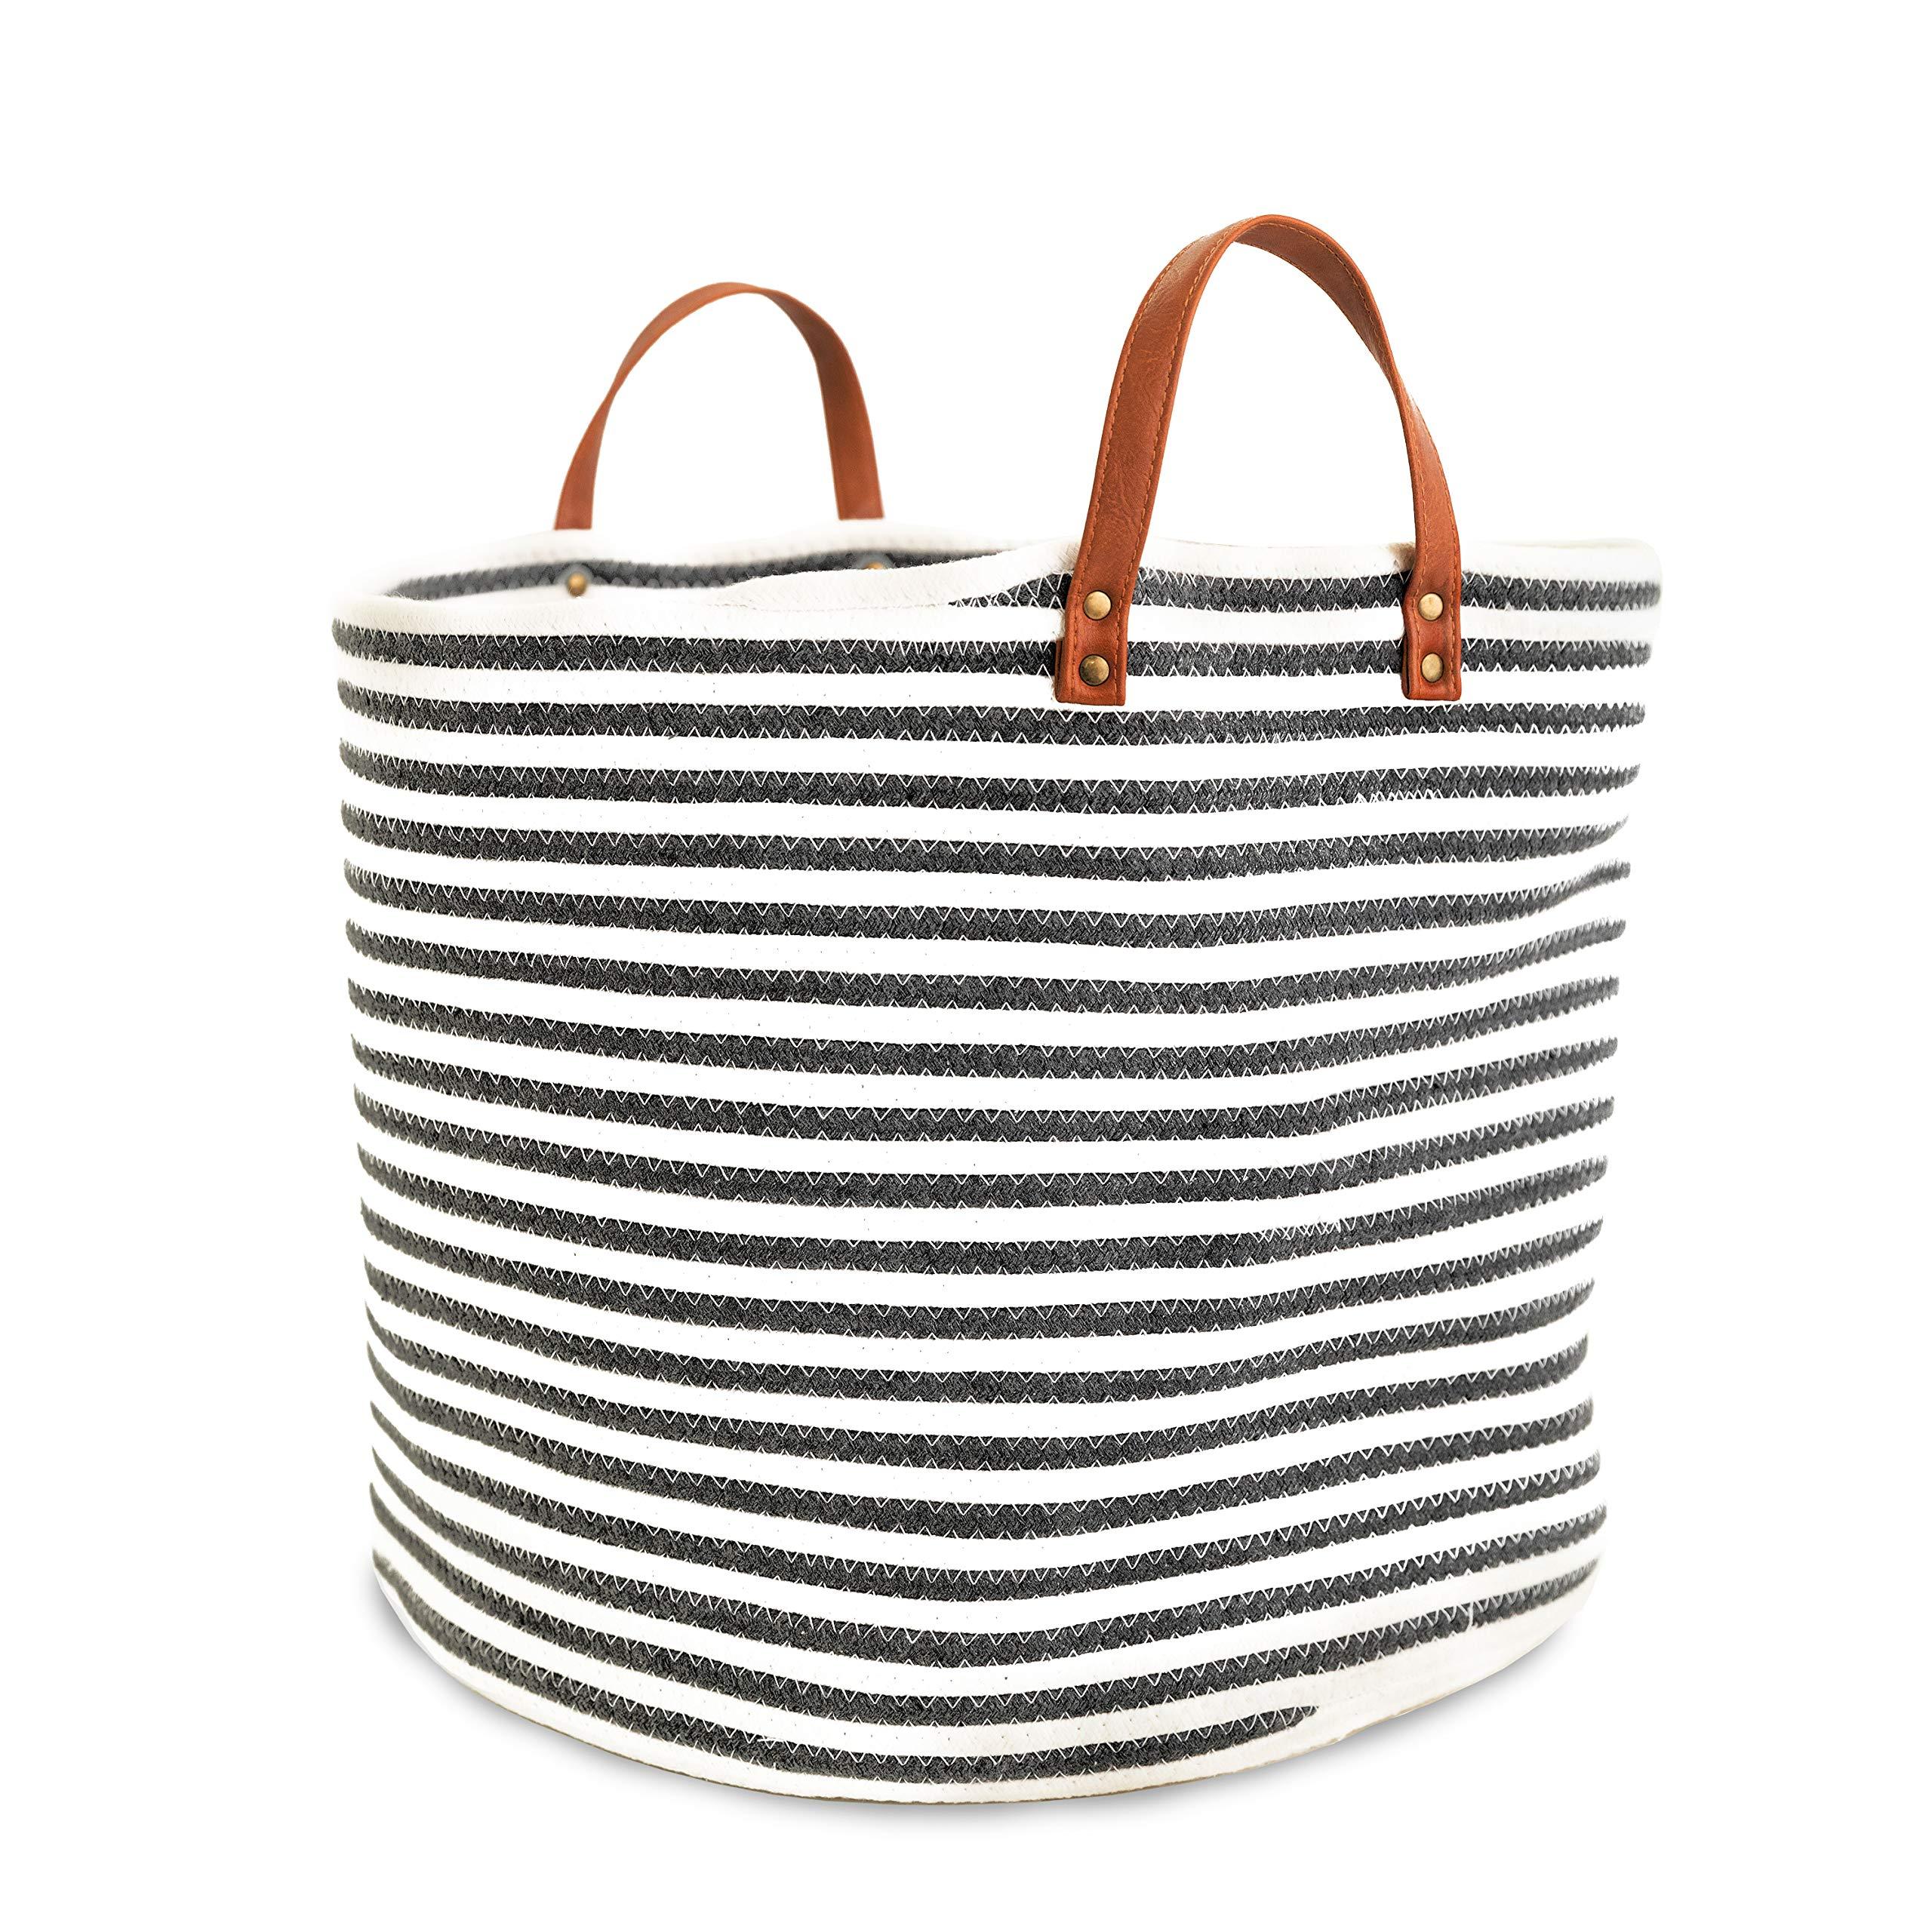 Large Cotton Rope Storage Basket 17'' Wide x 14.5'' Tall - Laundry Hamper - Woven Blanket Basket - Baby Nursery Storage Bin - Toy Organizer by MI RISINGSTAR